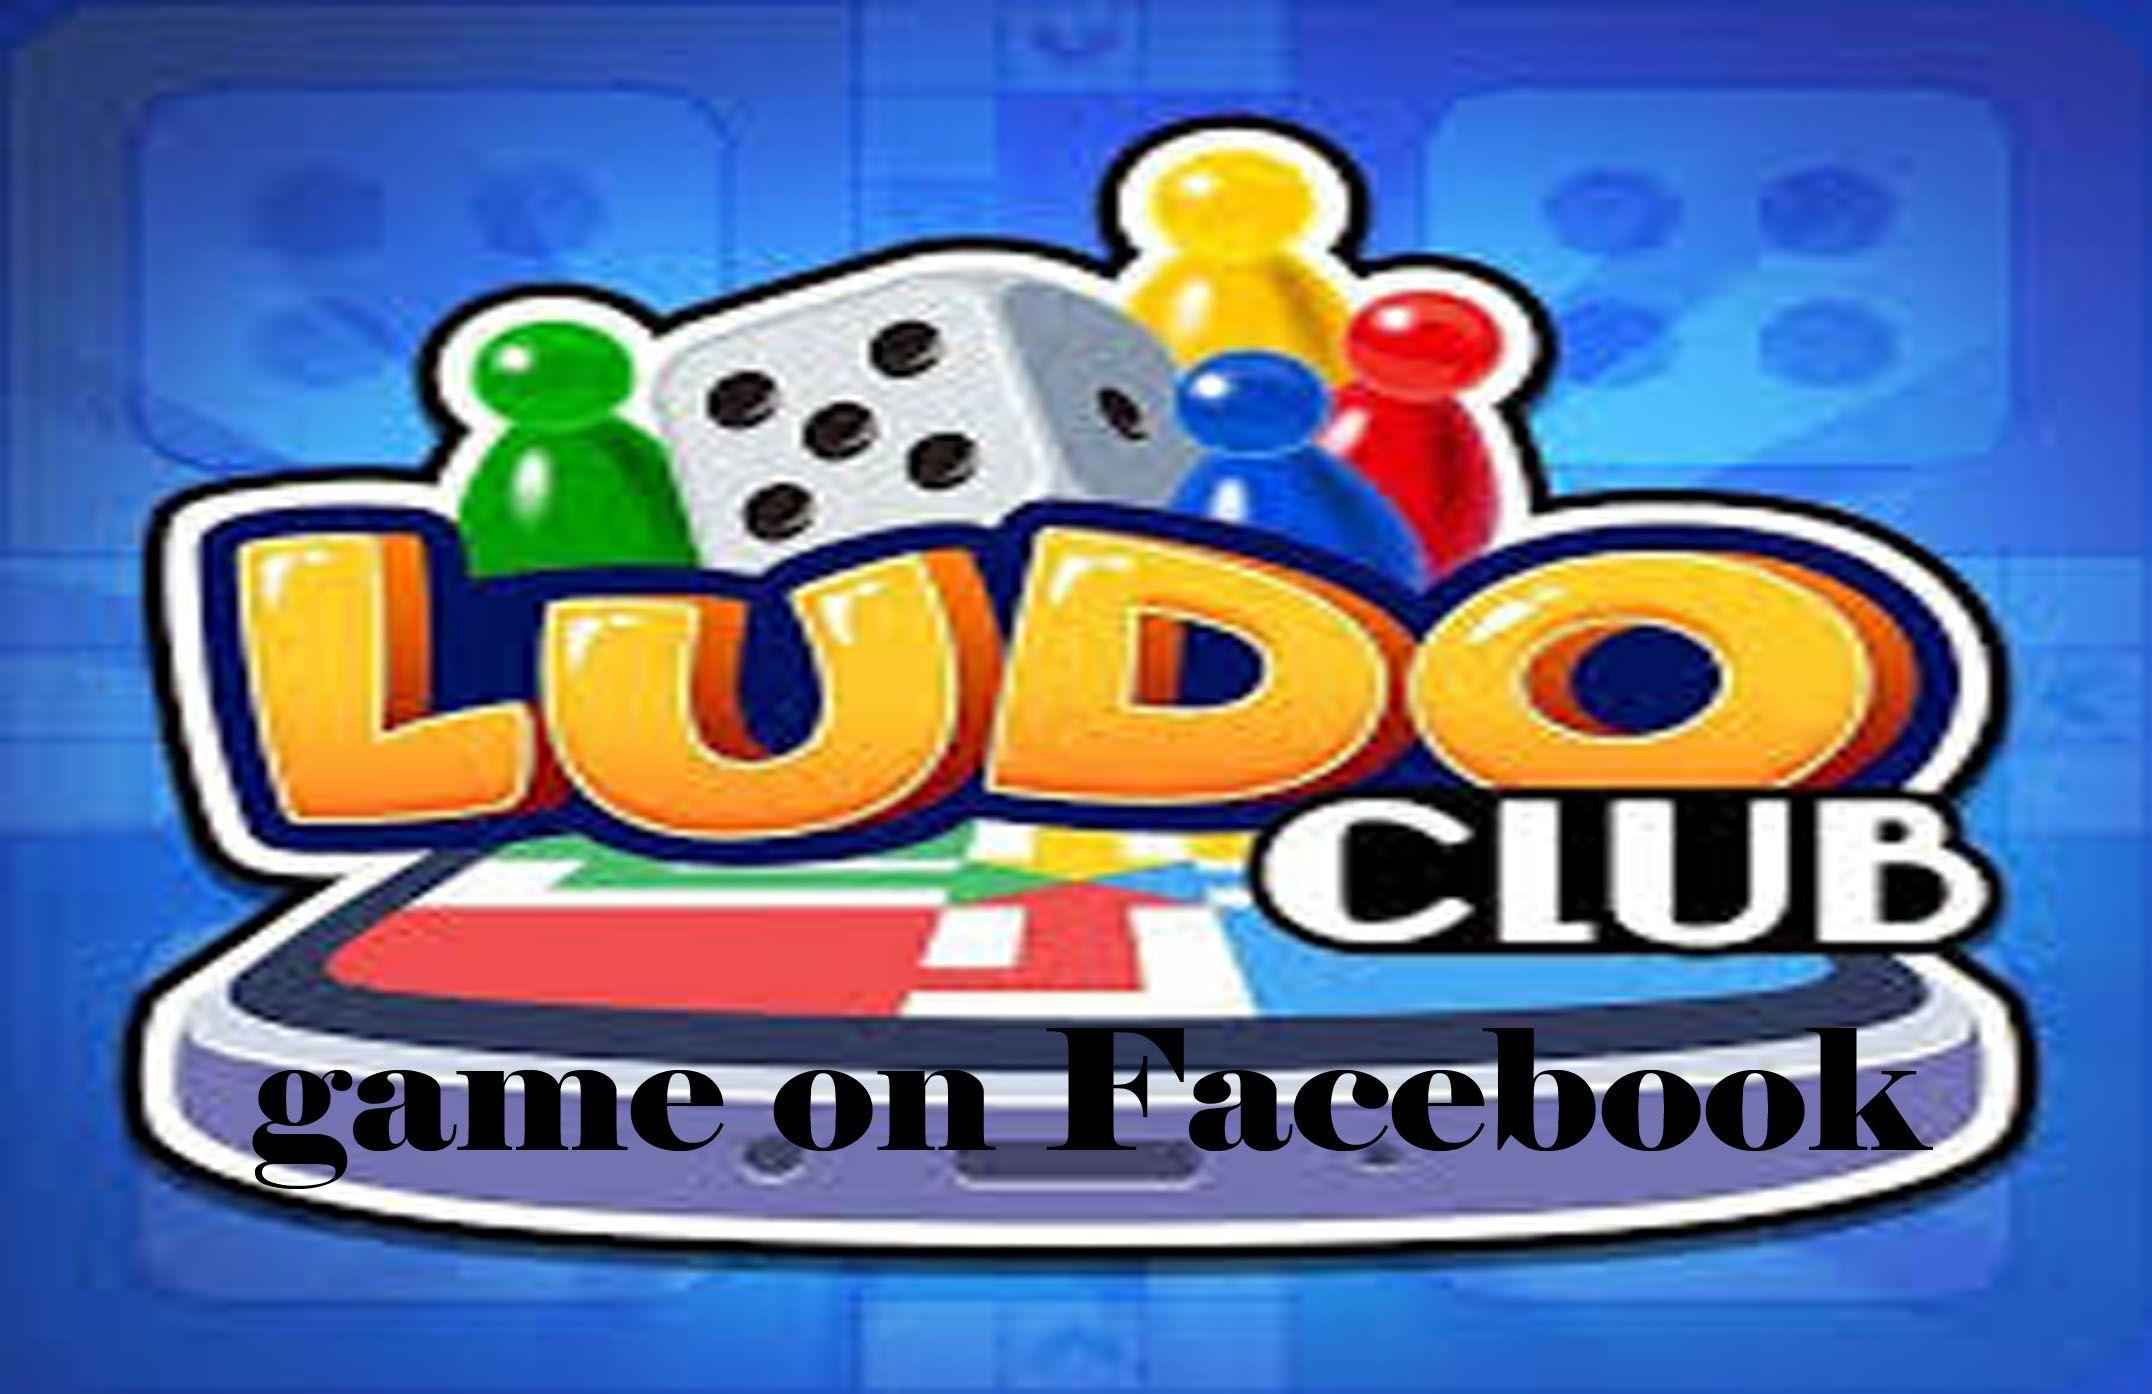 Ludo Club game on Facebook Facebook Messenger Games